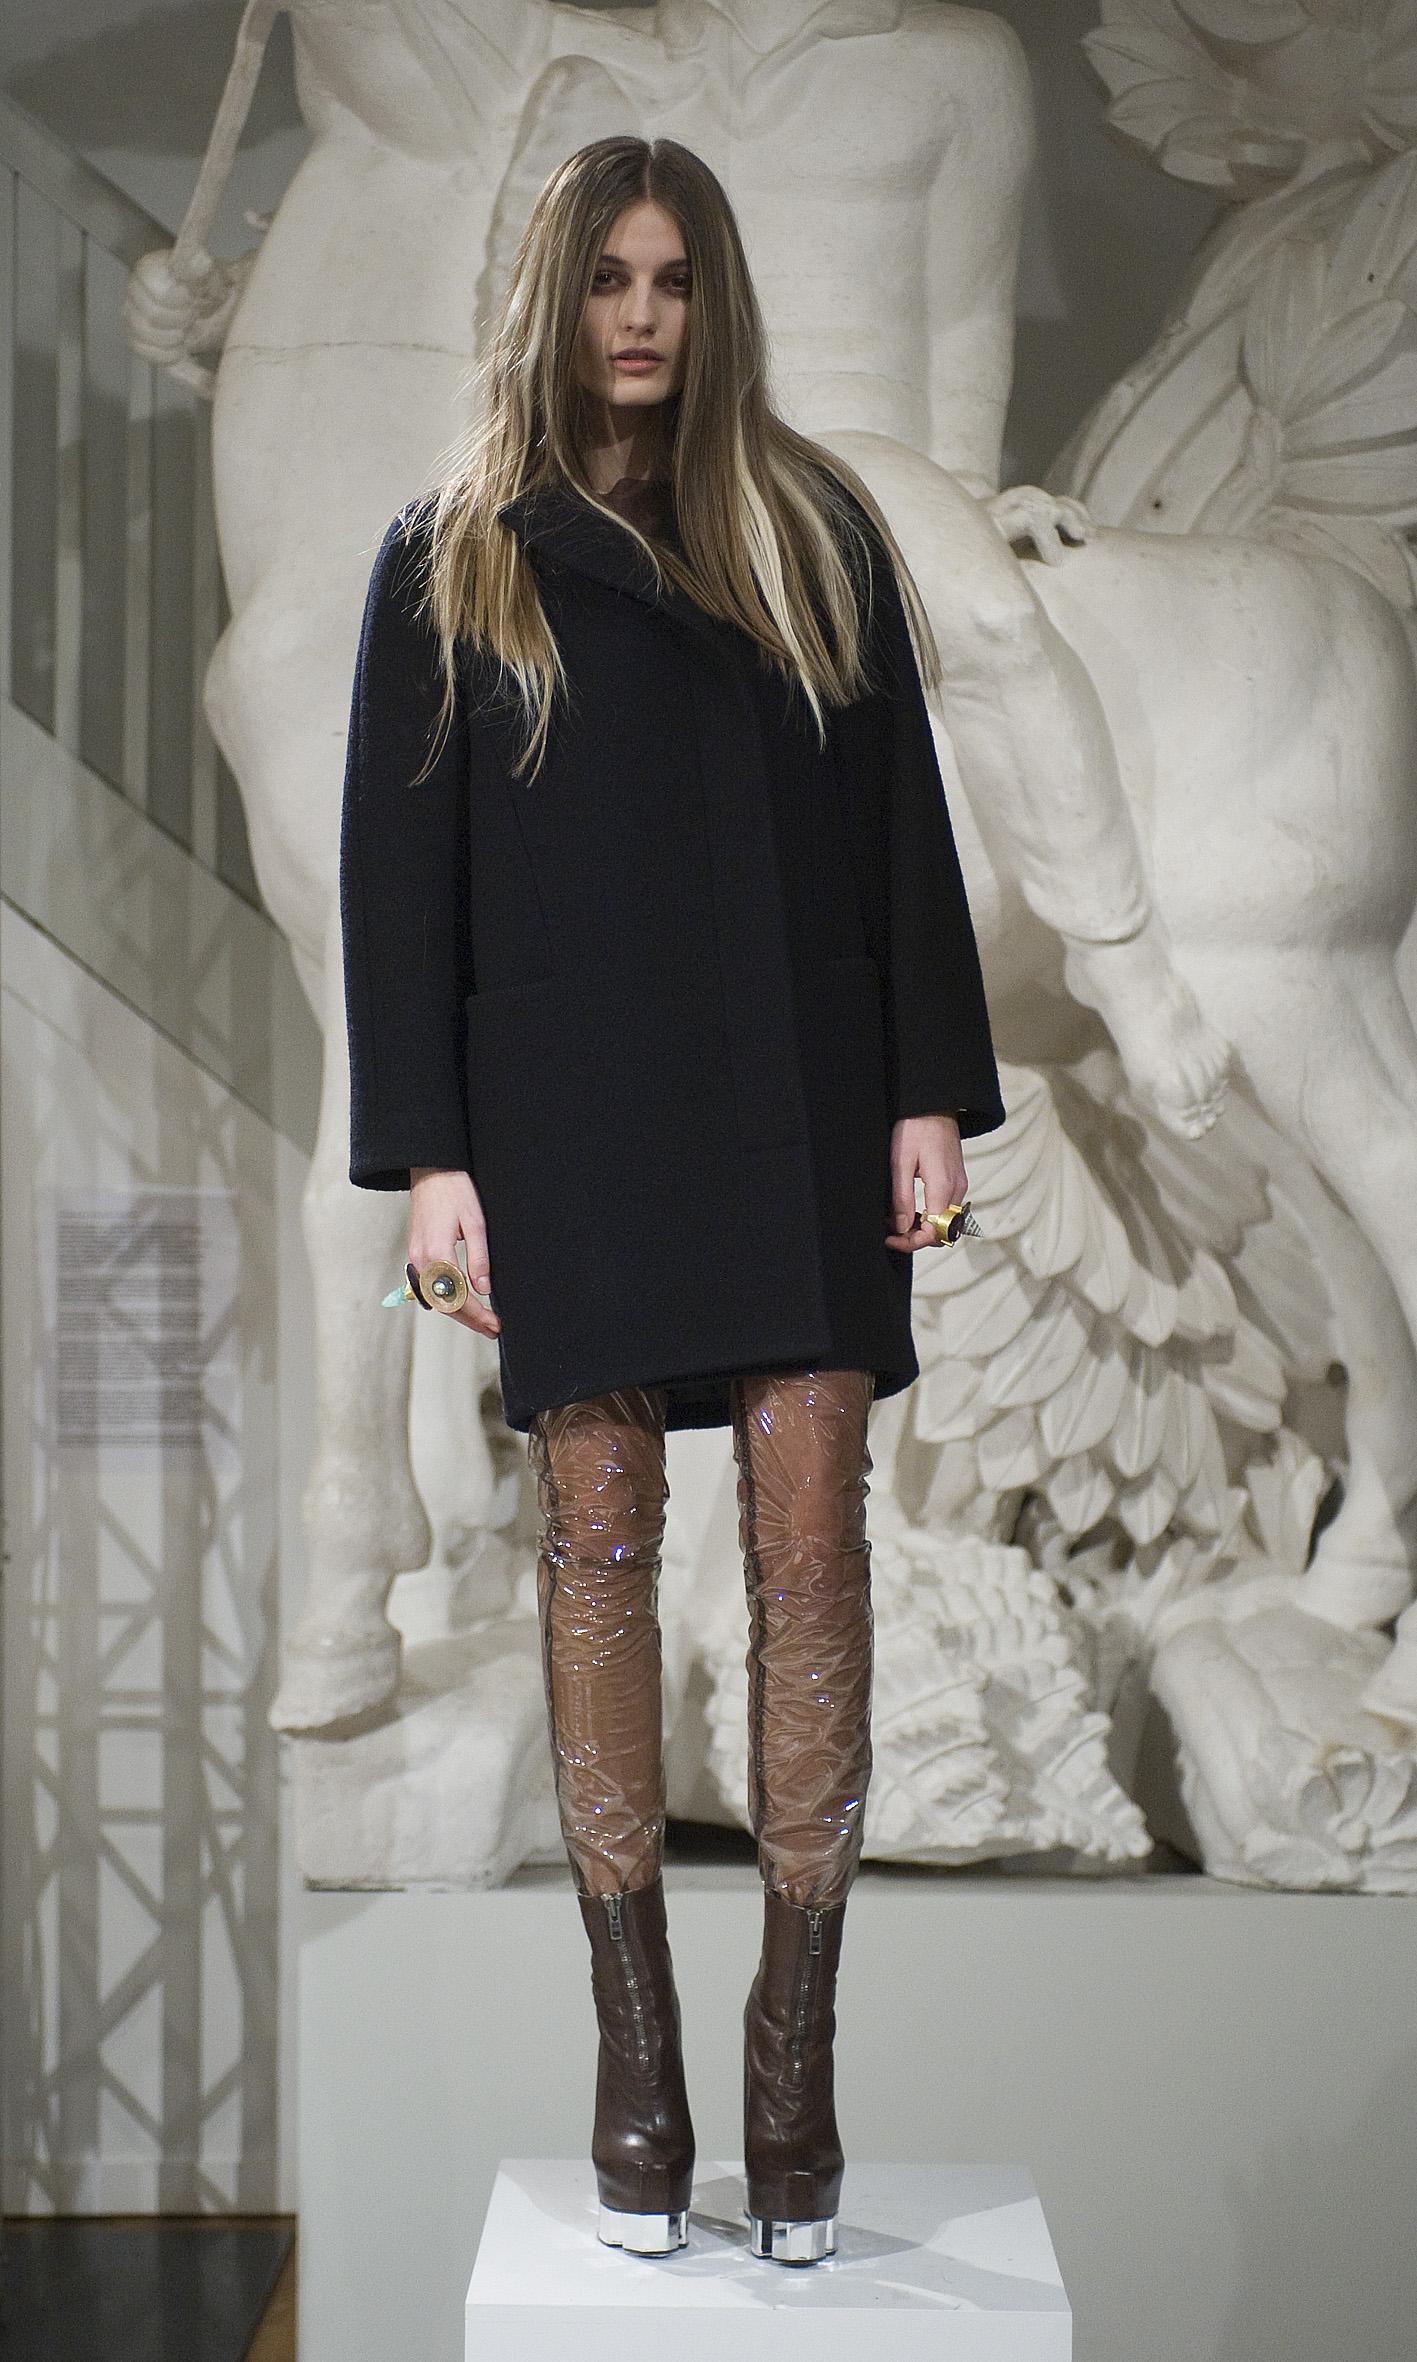 Stockholm Fashion Week: Acne Fall 2009